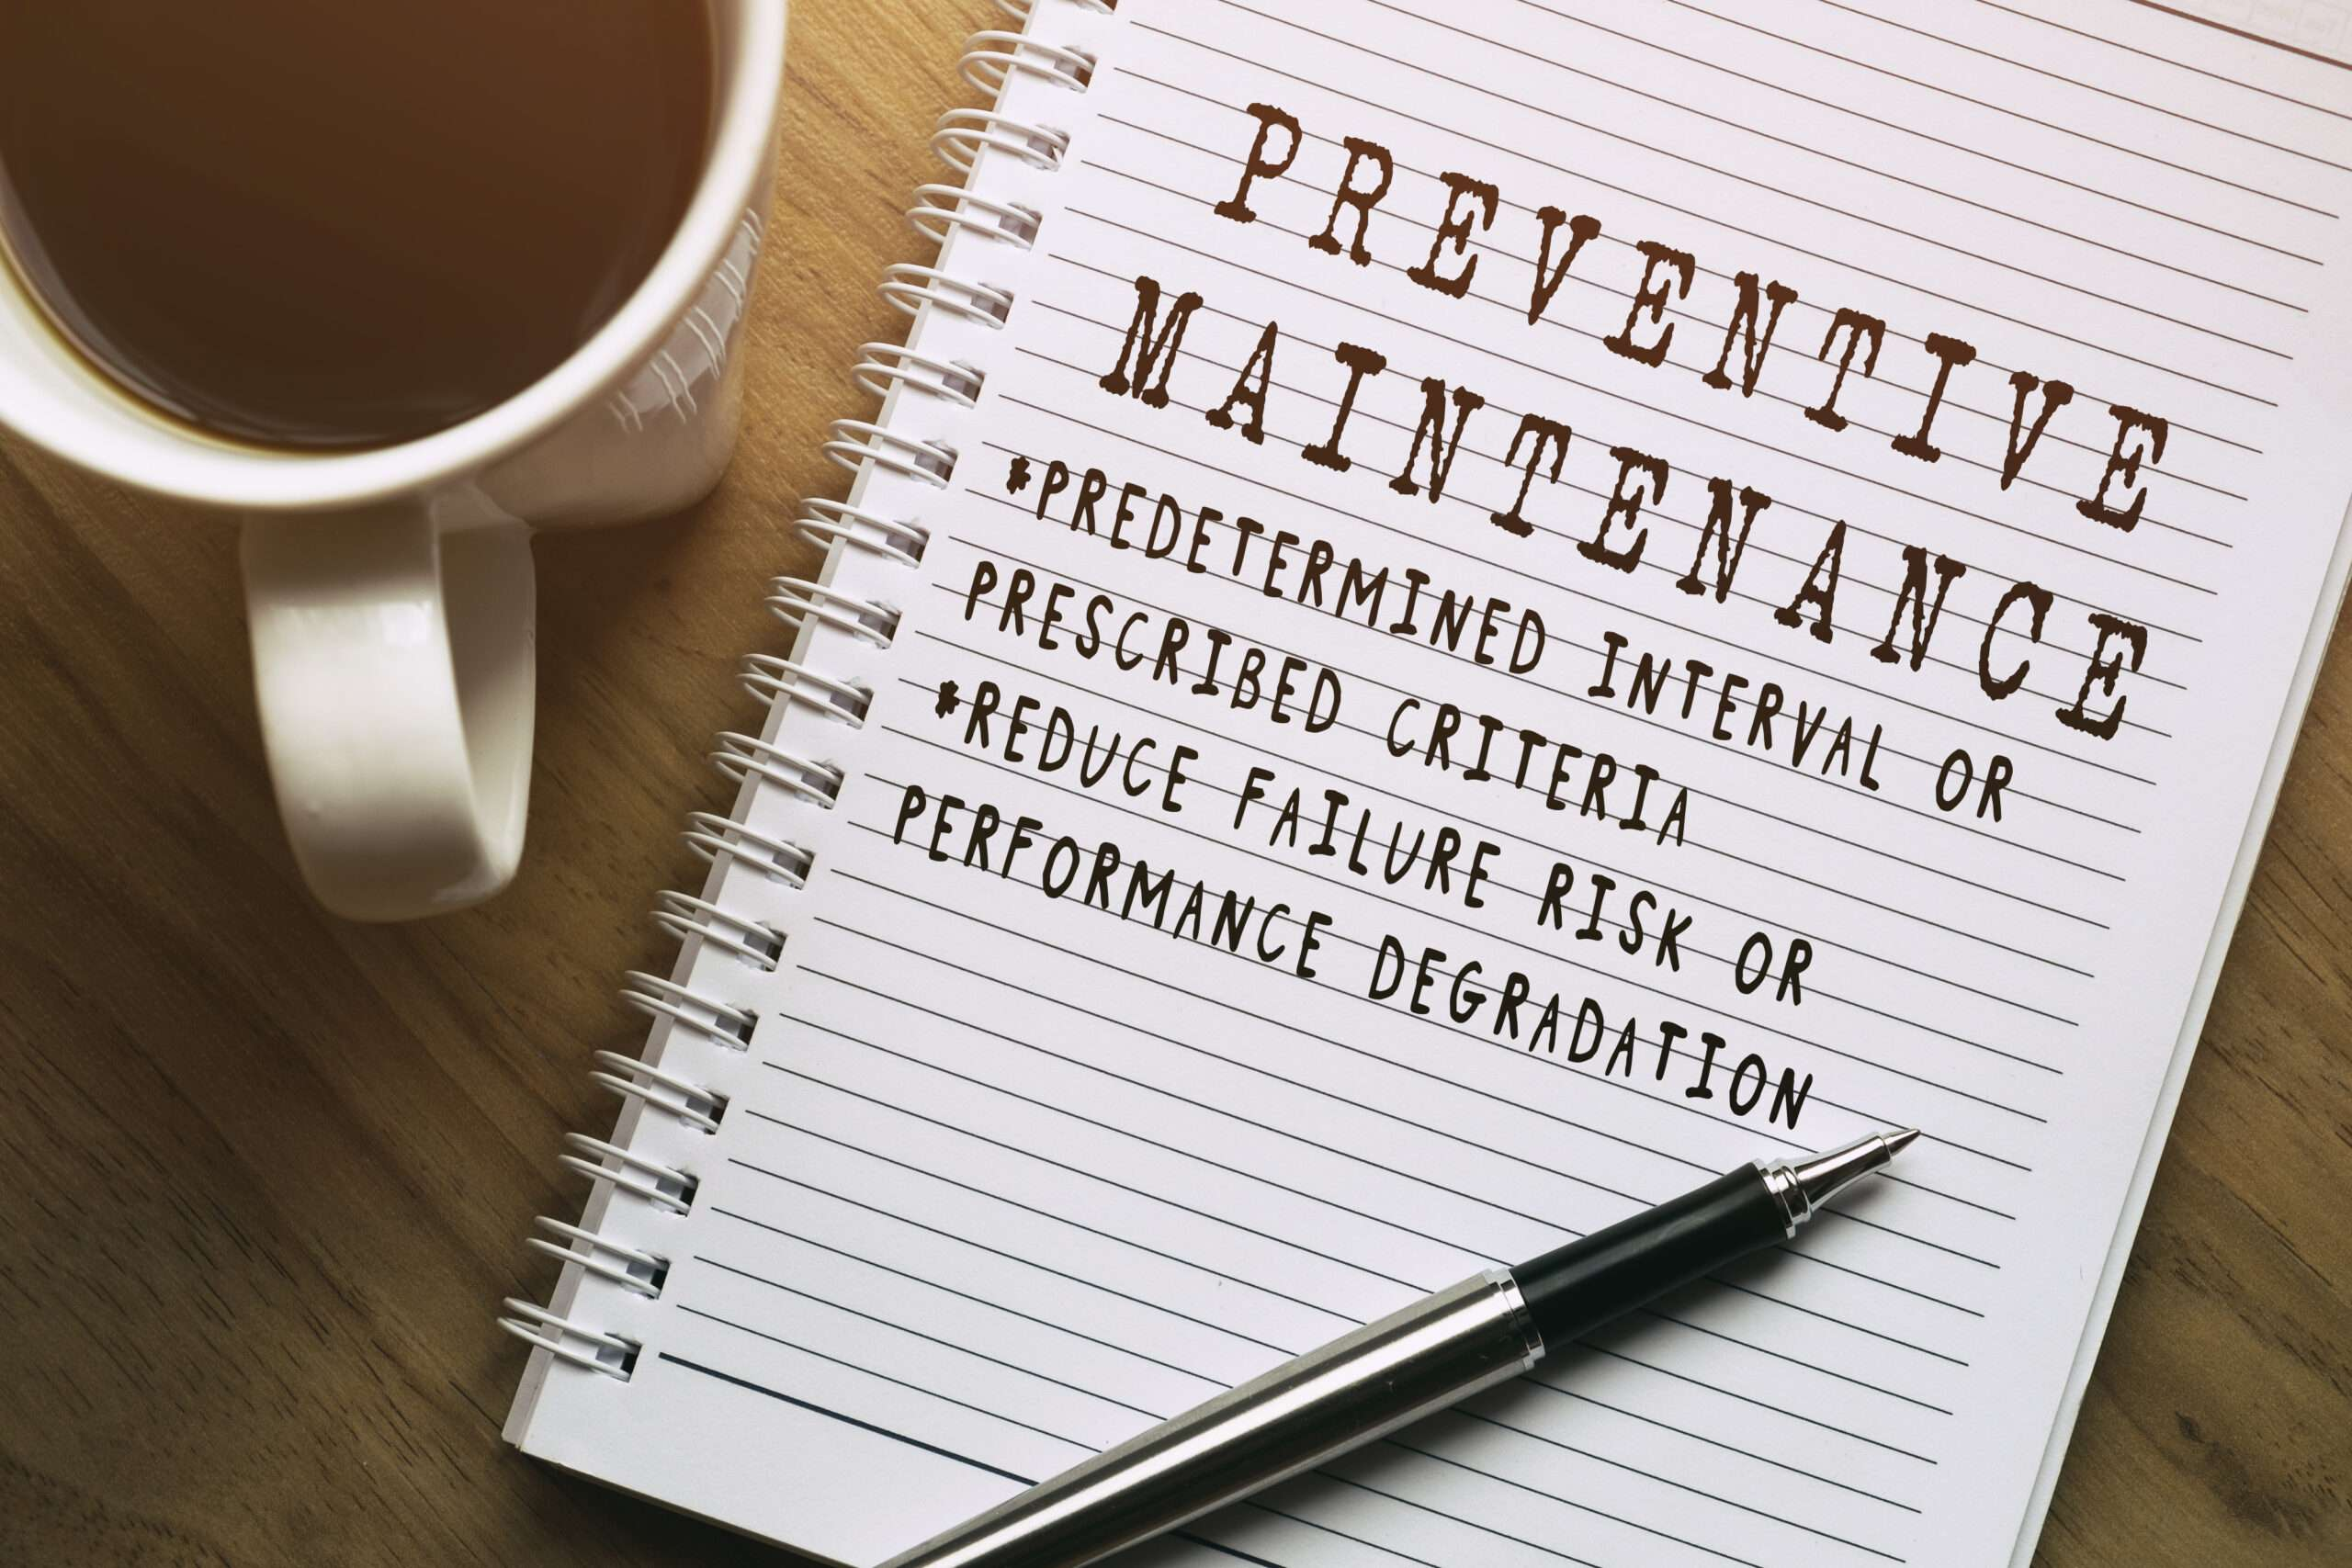 note titled 'PREVENTIVE MAINTENANCE'